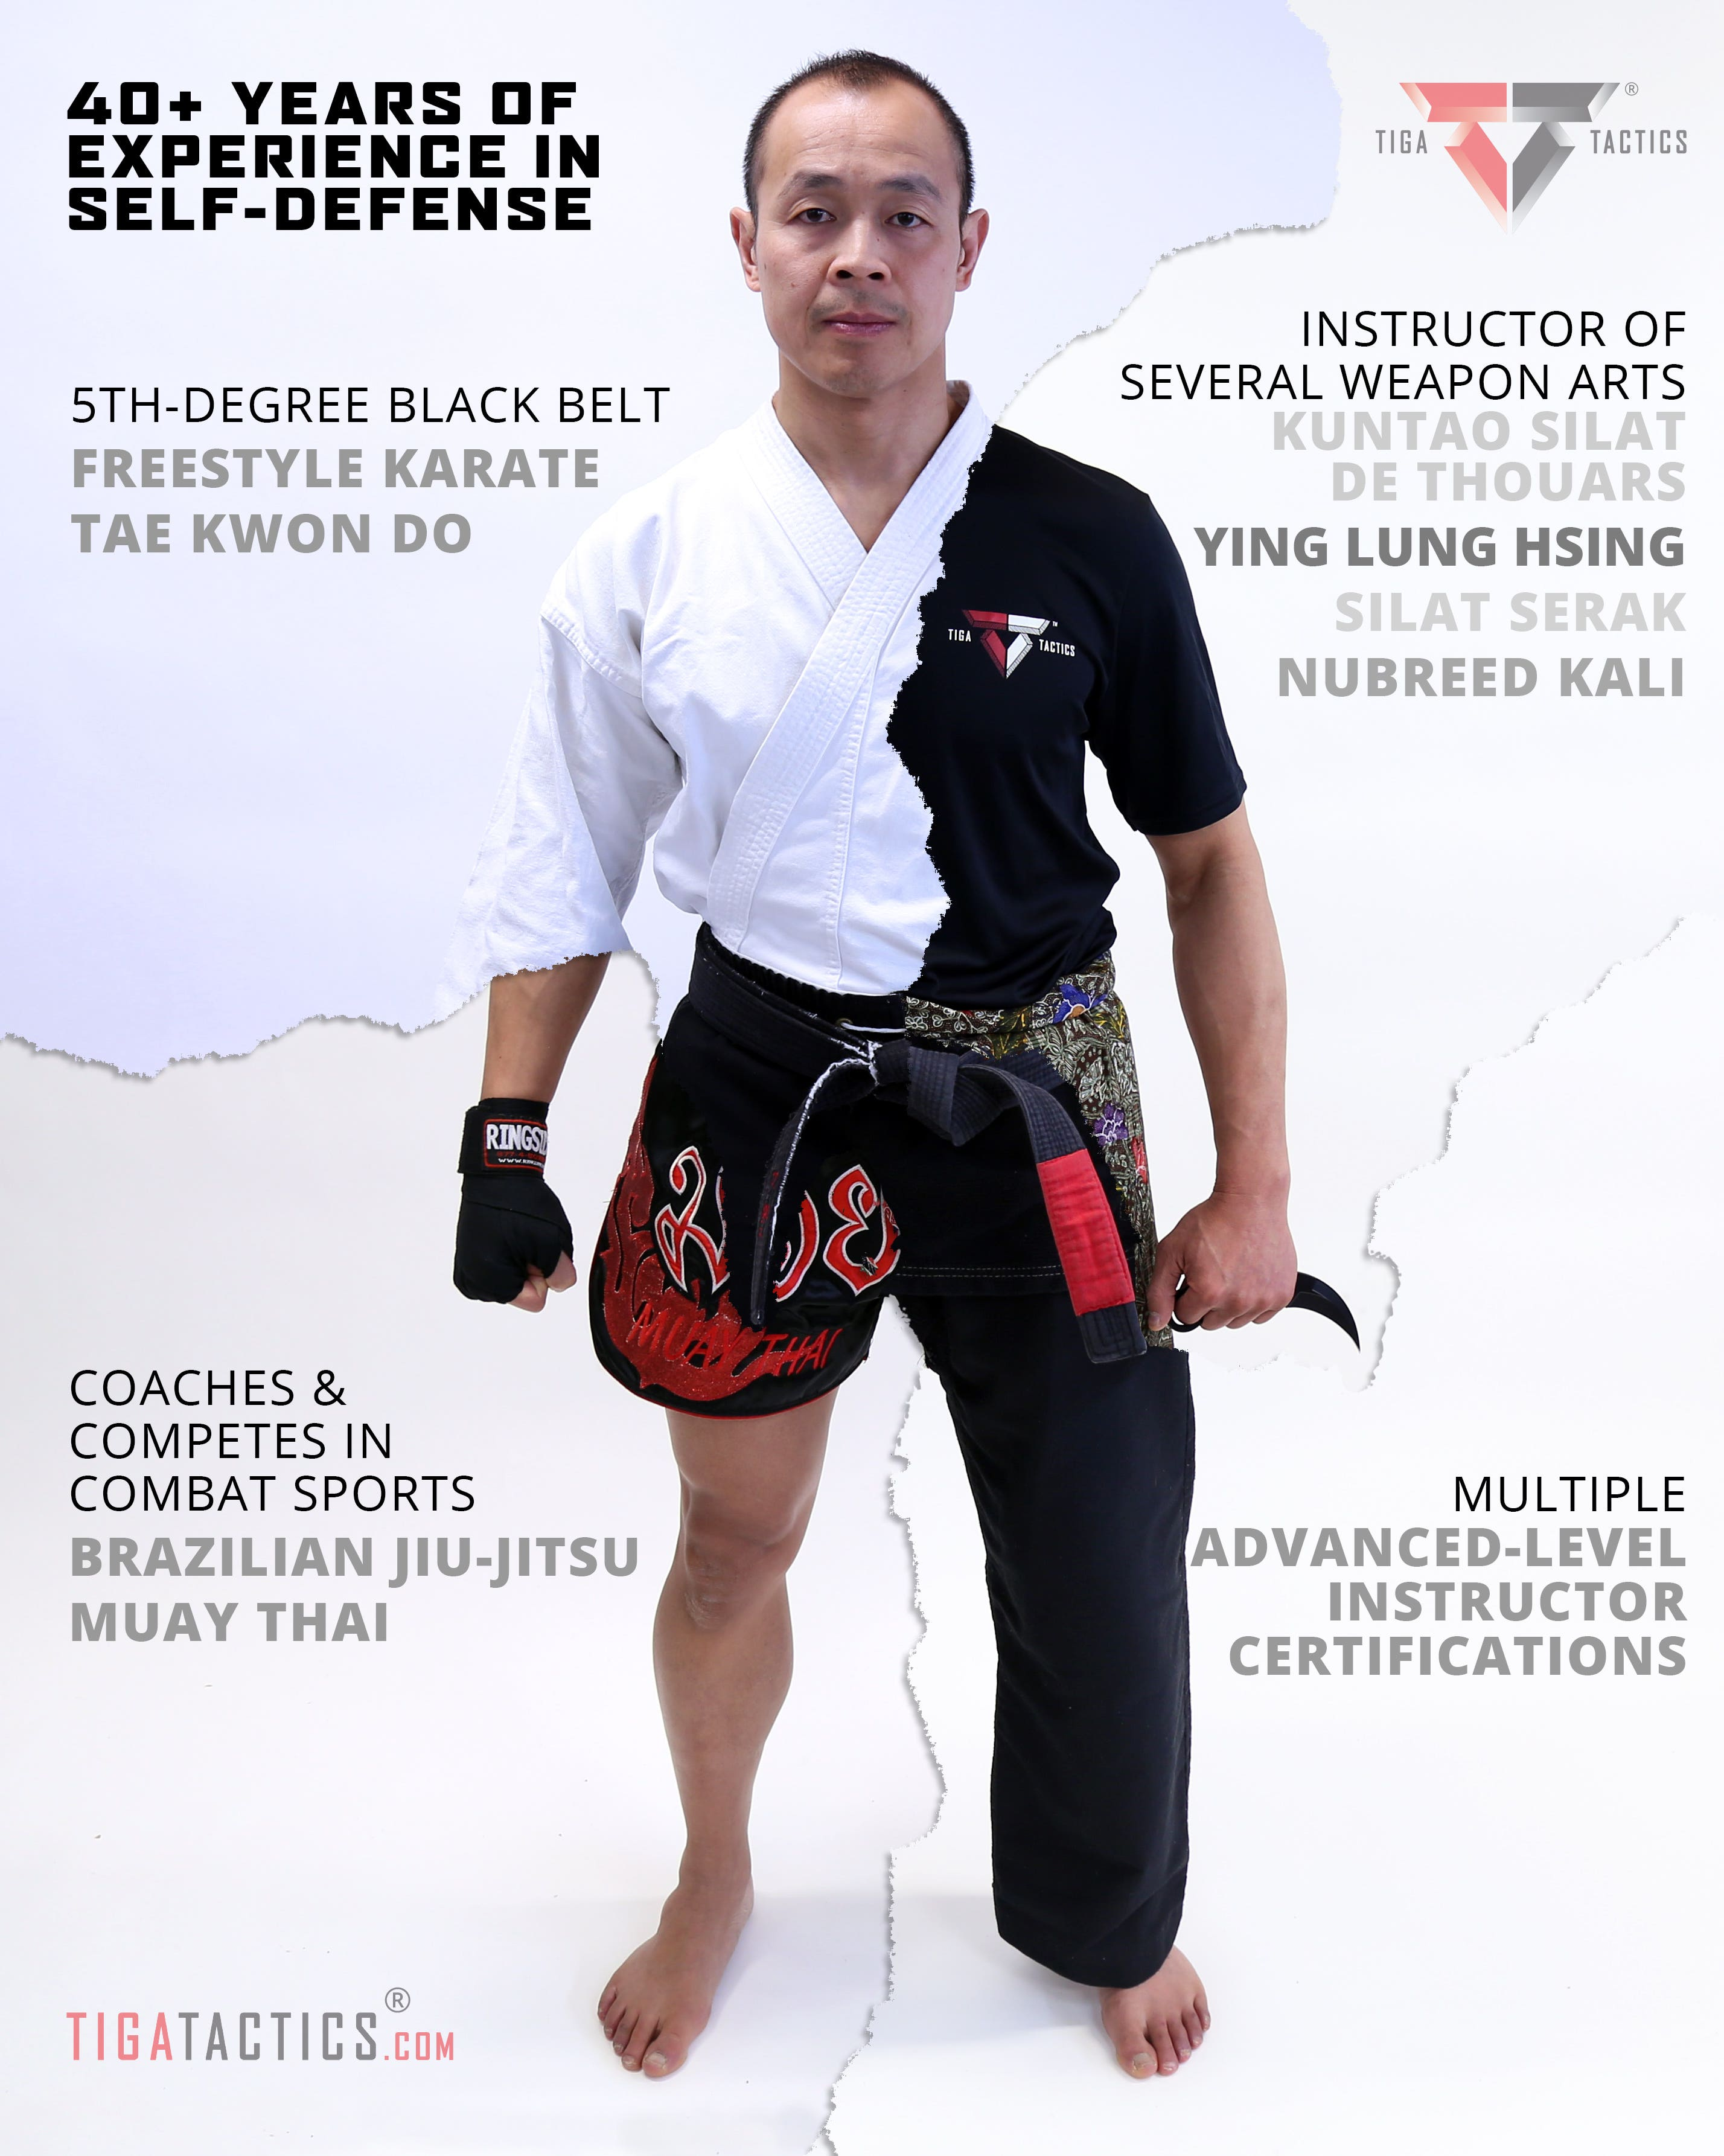 Image of Dr. Conrad Bui